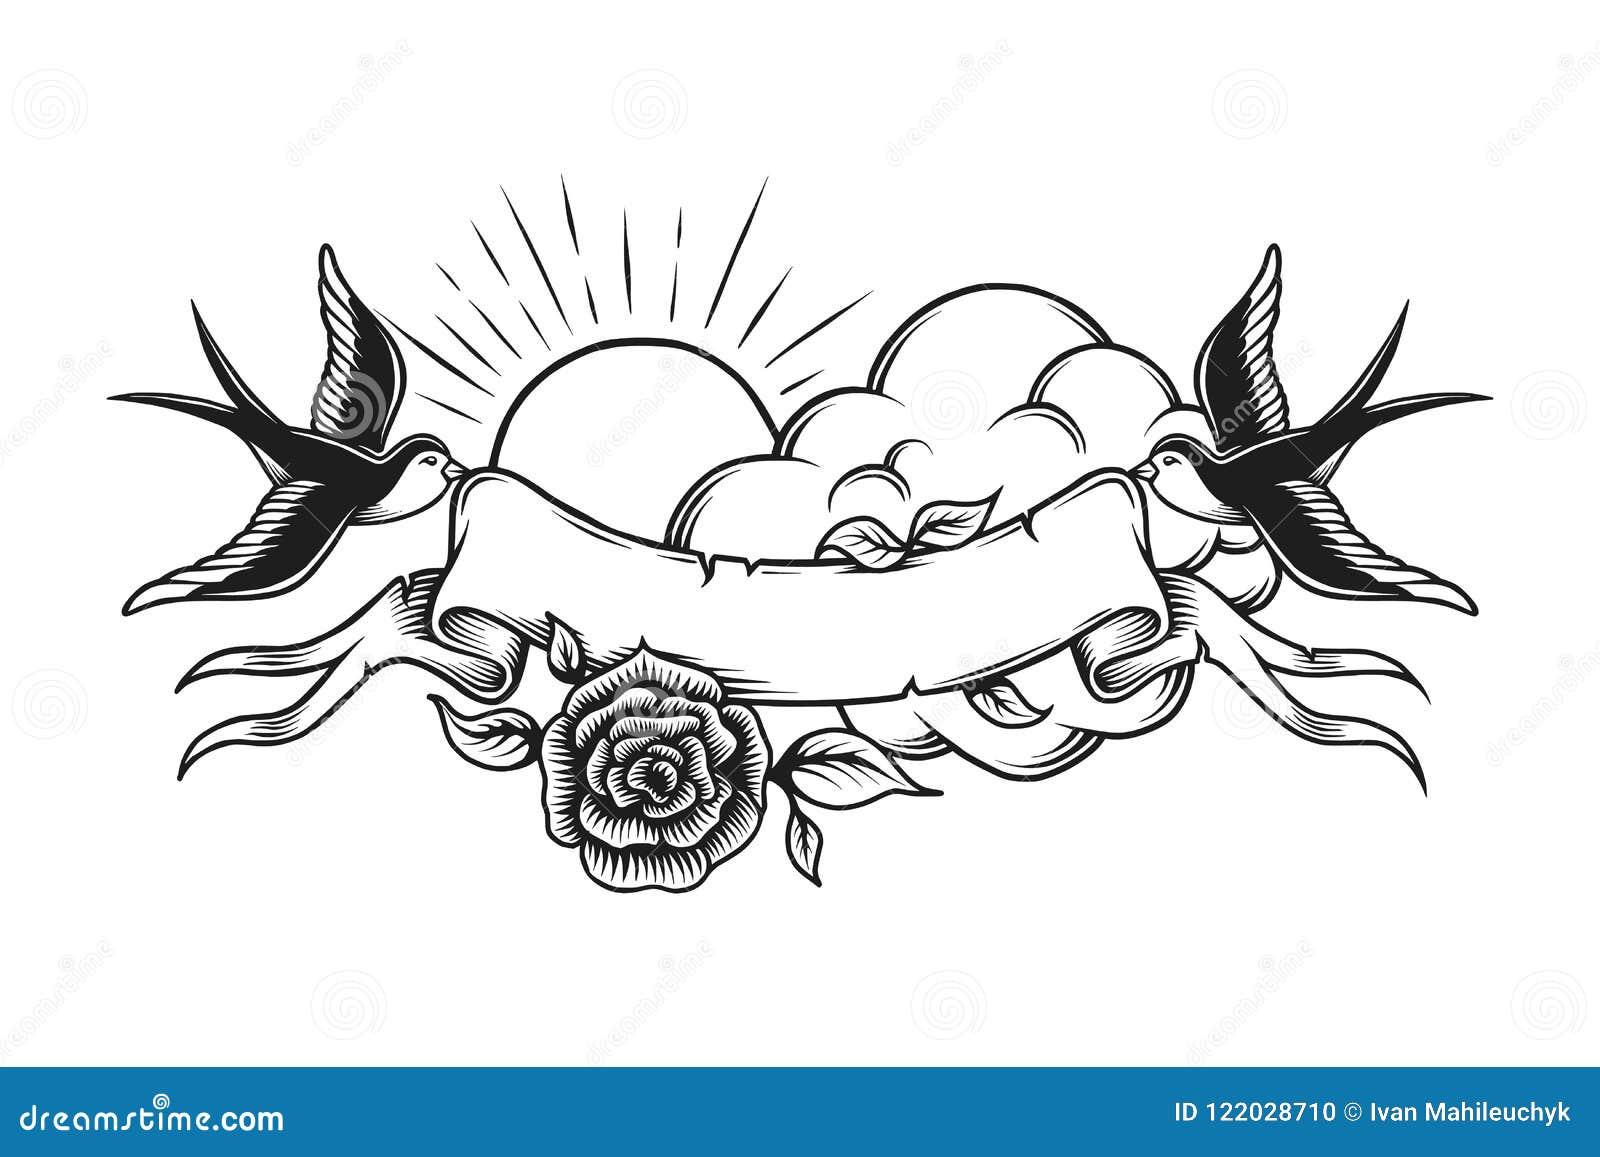 Vintage Romantic Tattoo Design Template Stock Vector